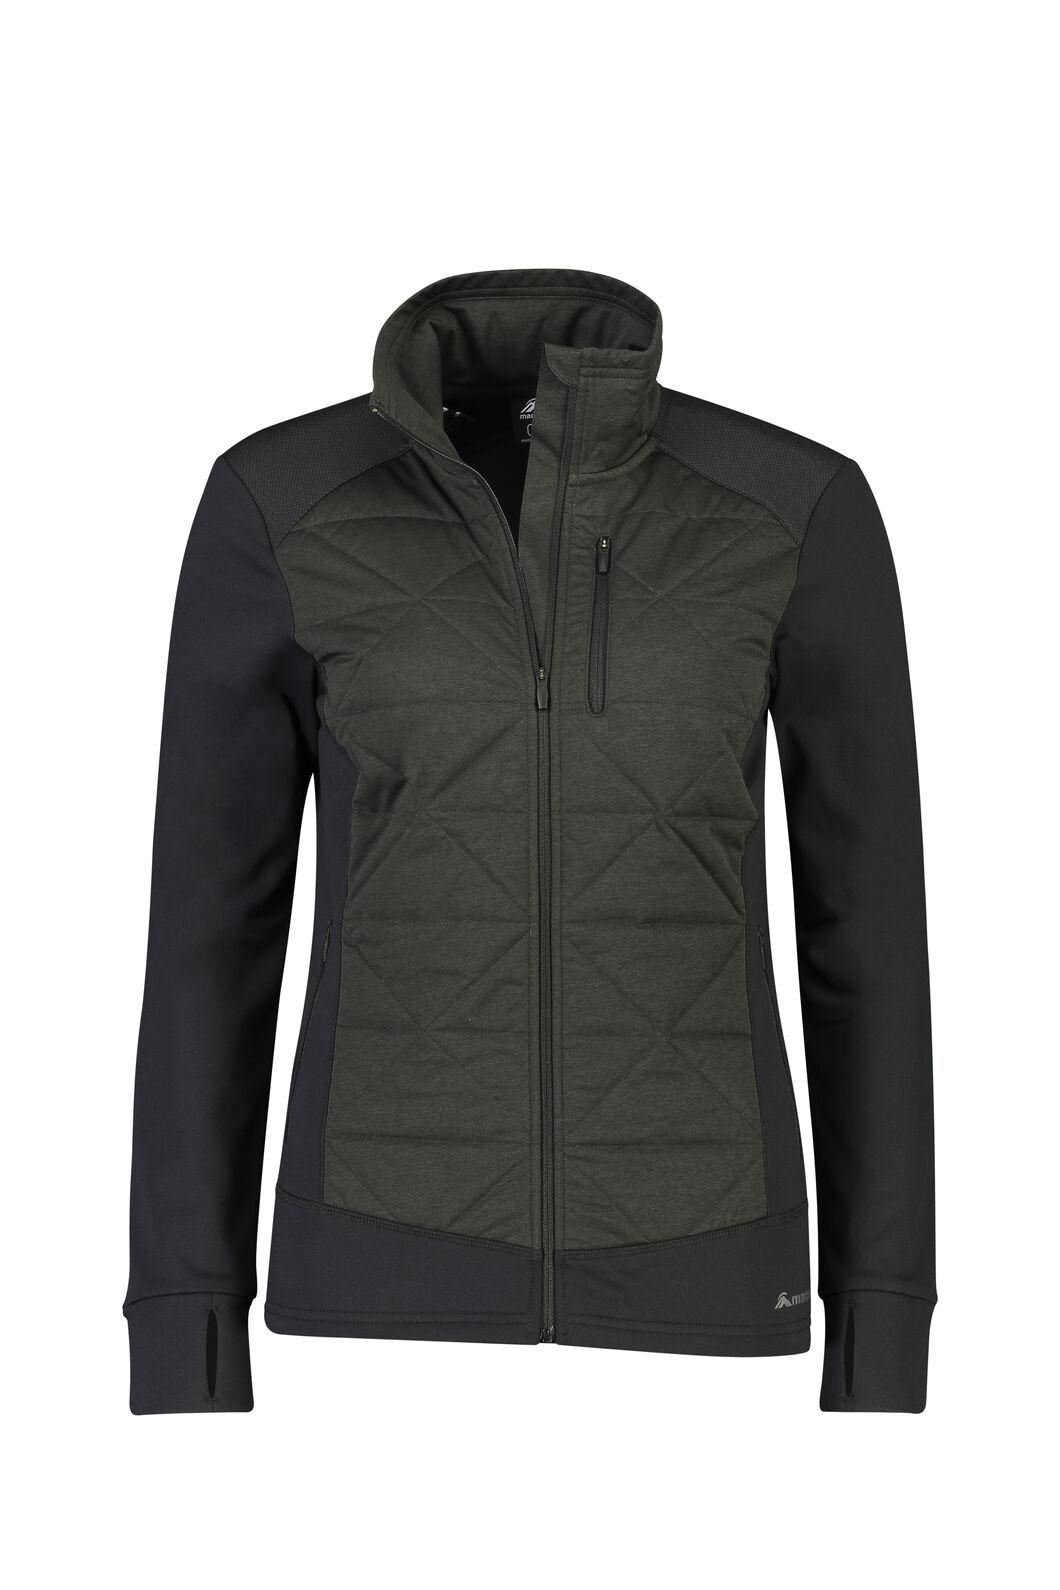 Macpac Accelerate PrimaLoft® Jacket - Women's, Black, hi-res